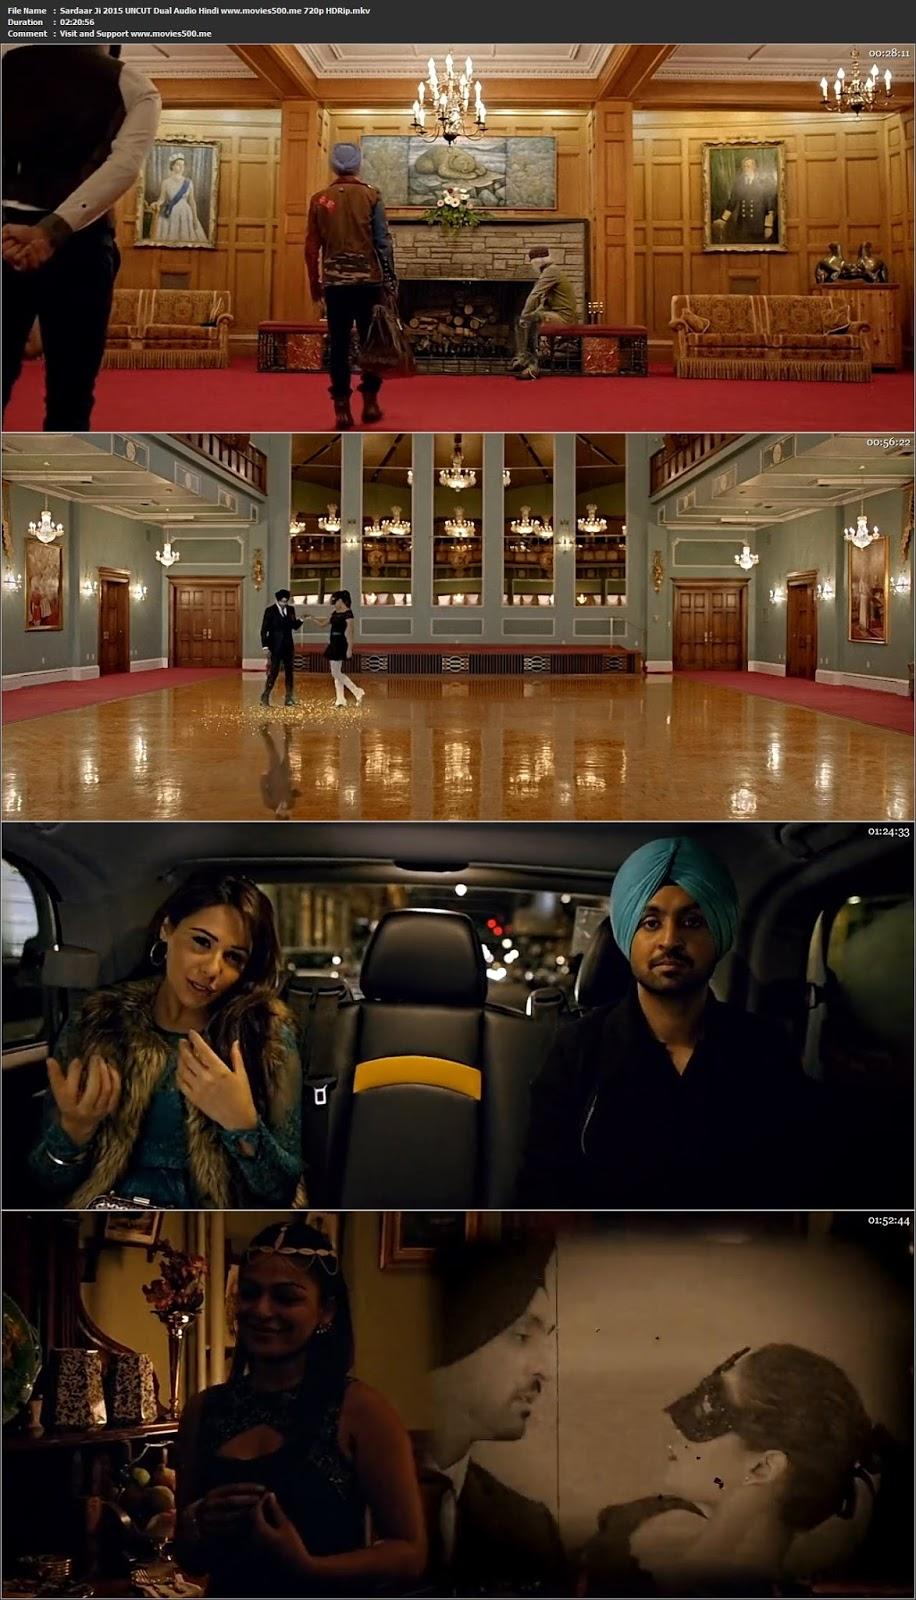 Sardaar Ji 2015 UNCUT Punjabi Movie HDRip 720p 1.4GB at s400.bet